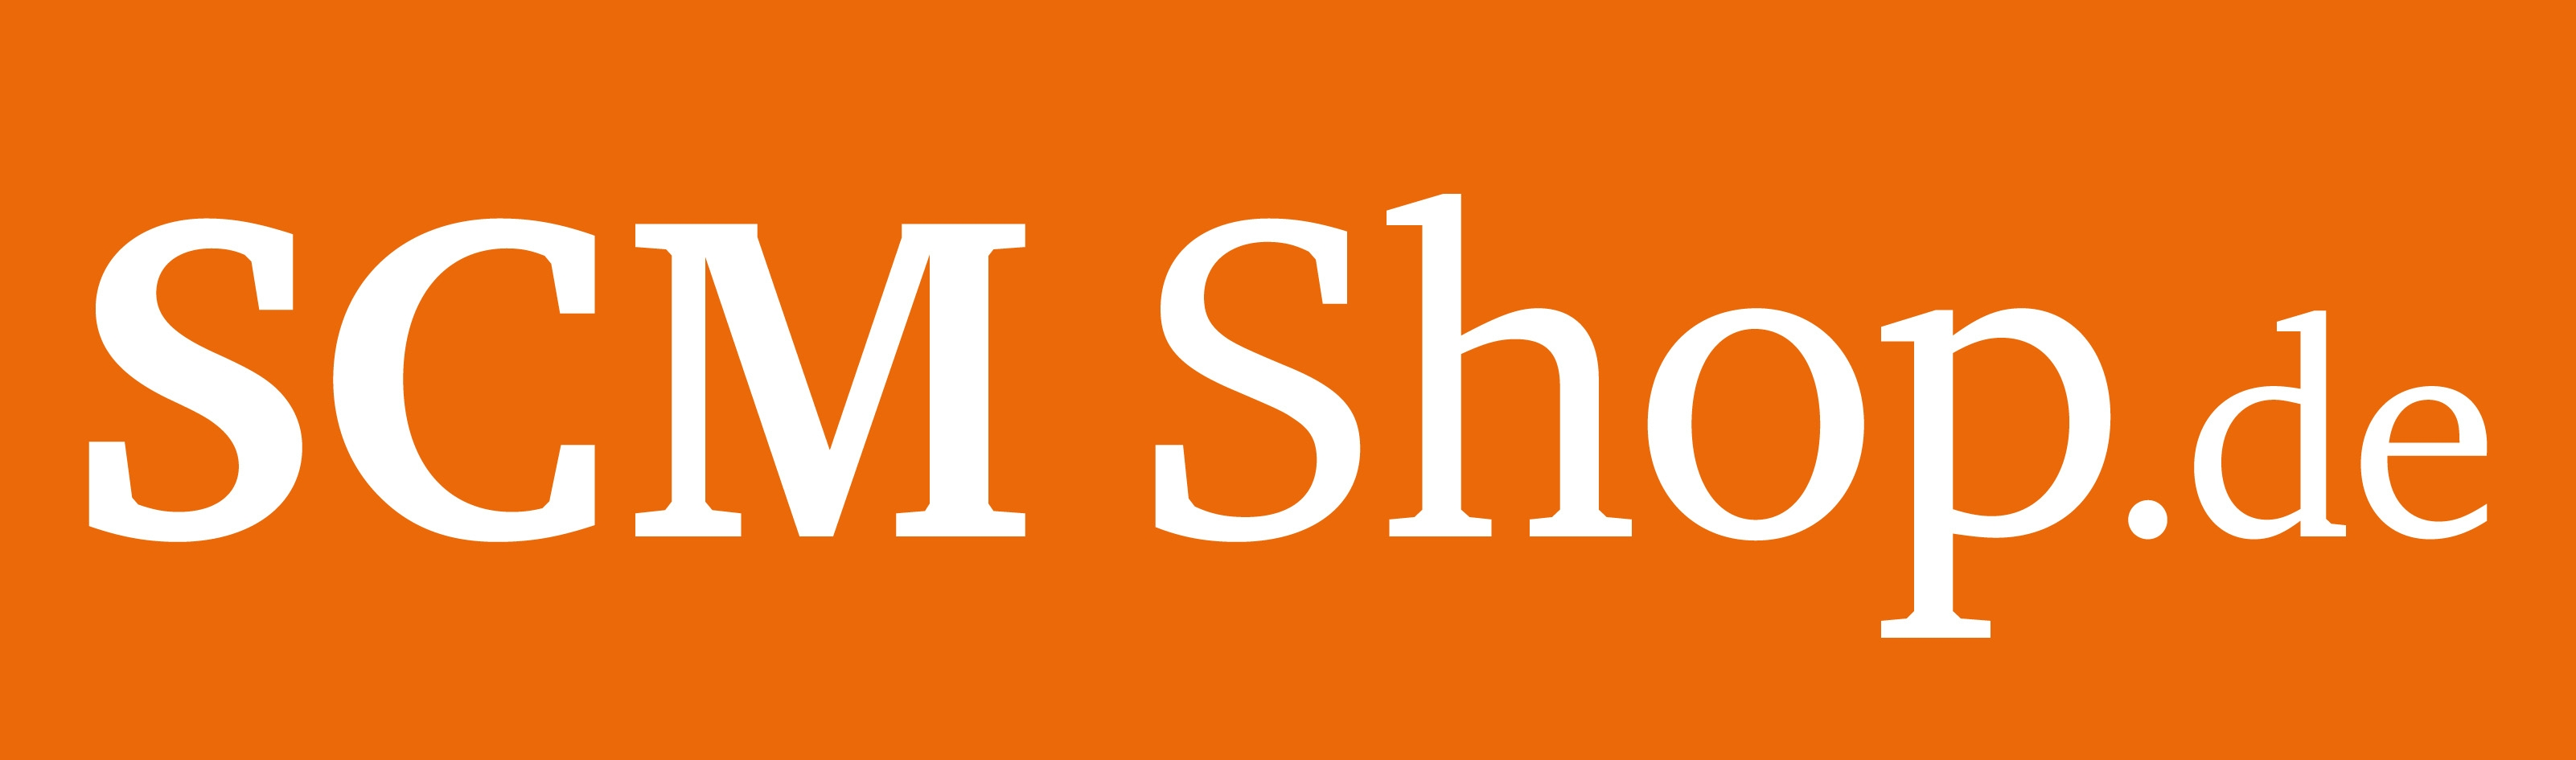 SCM_Shop_Logo